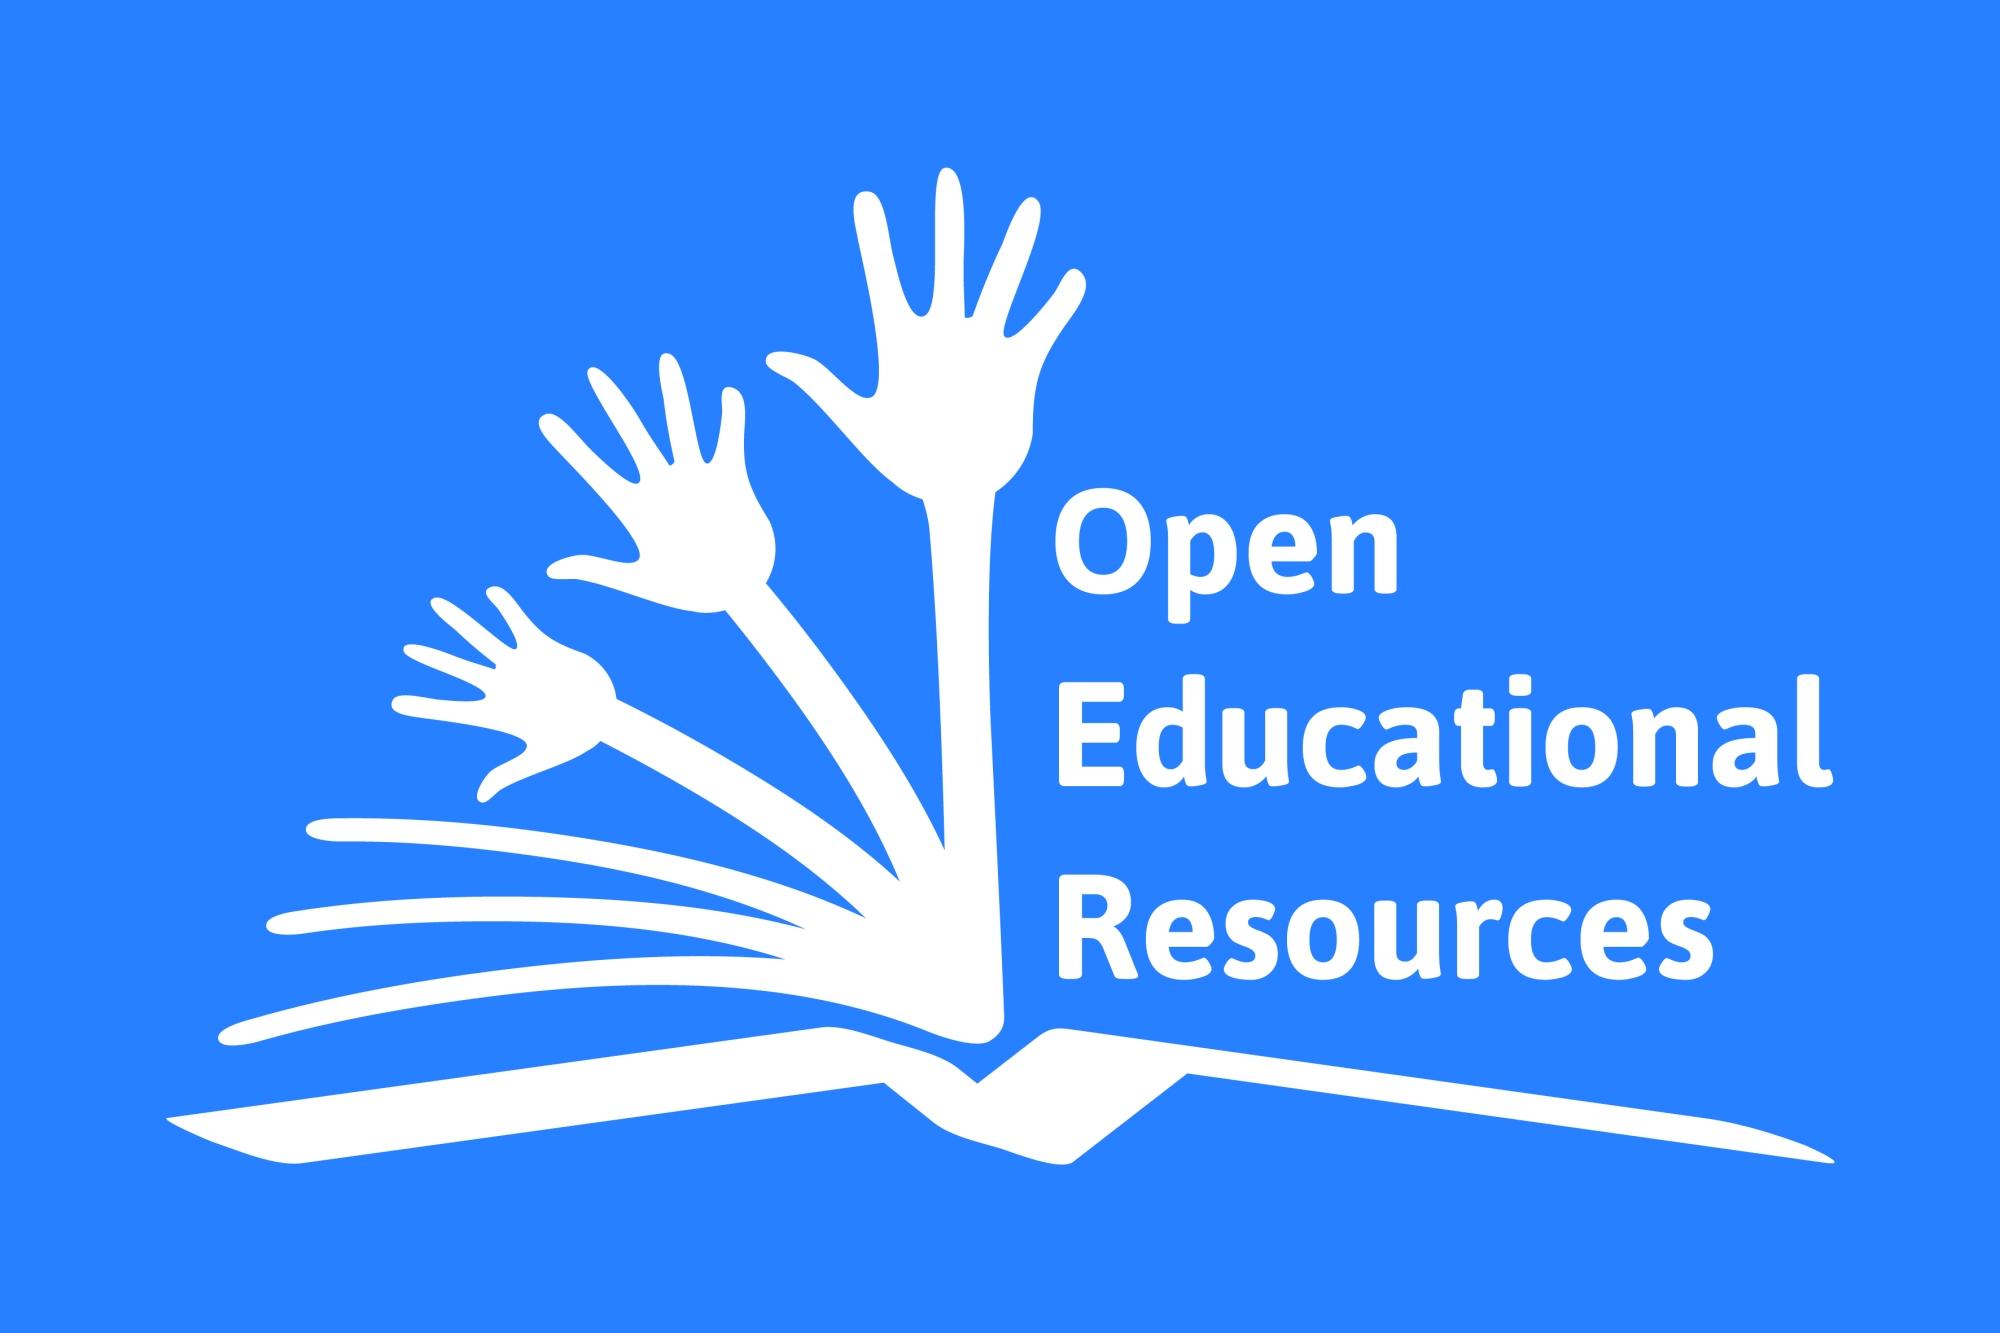 UNESCO Global Open Educational Resources Logo